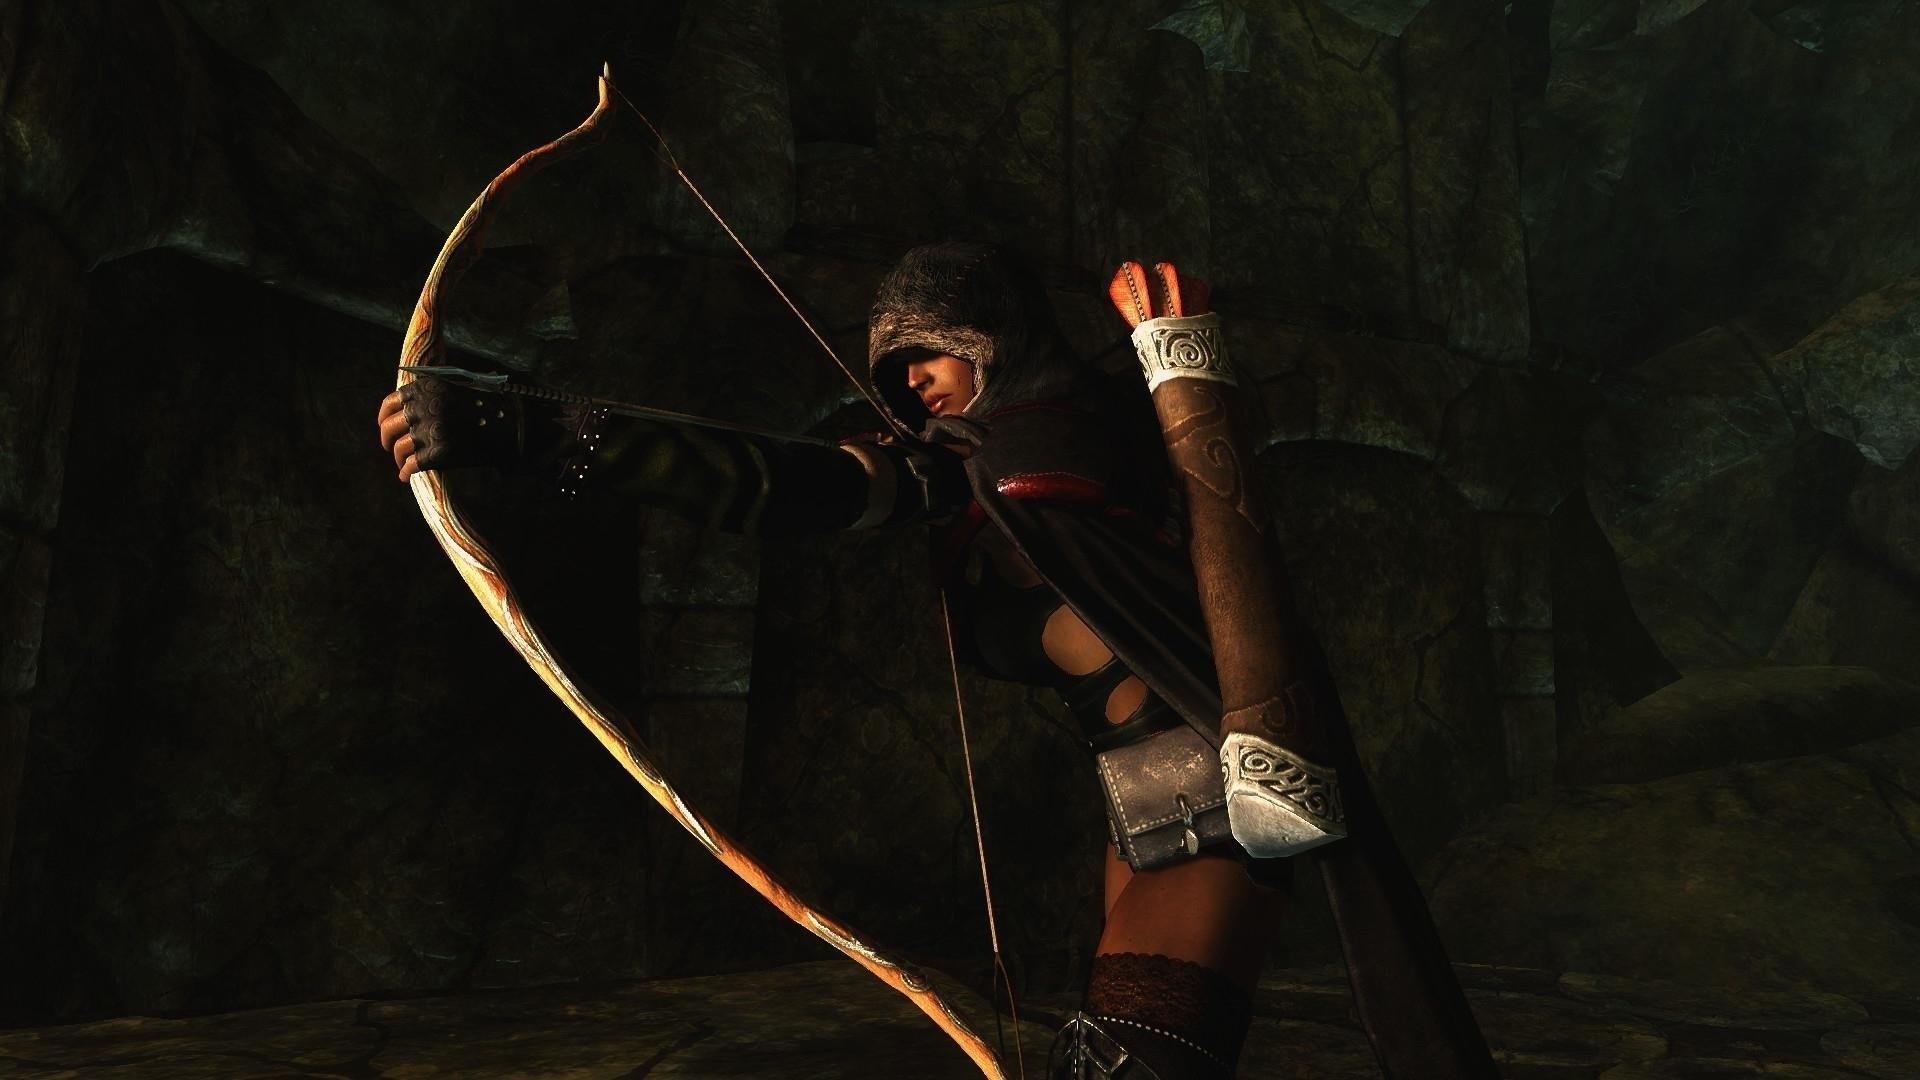 Archery wallpaper for desktop